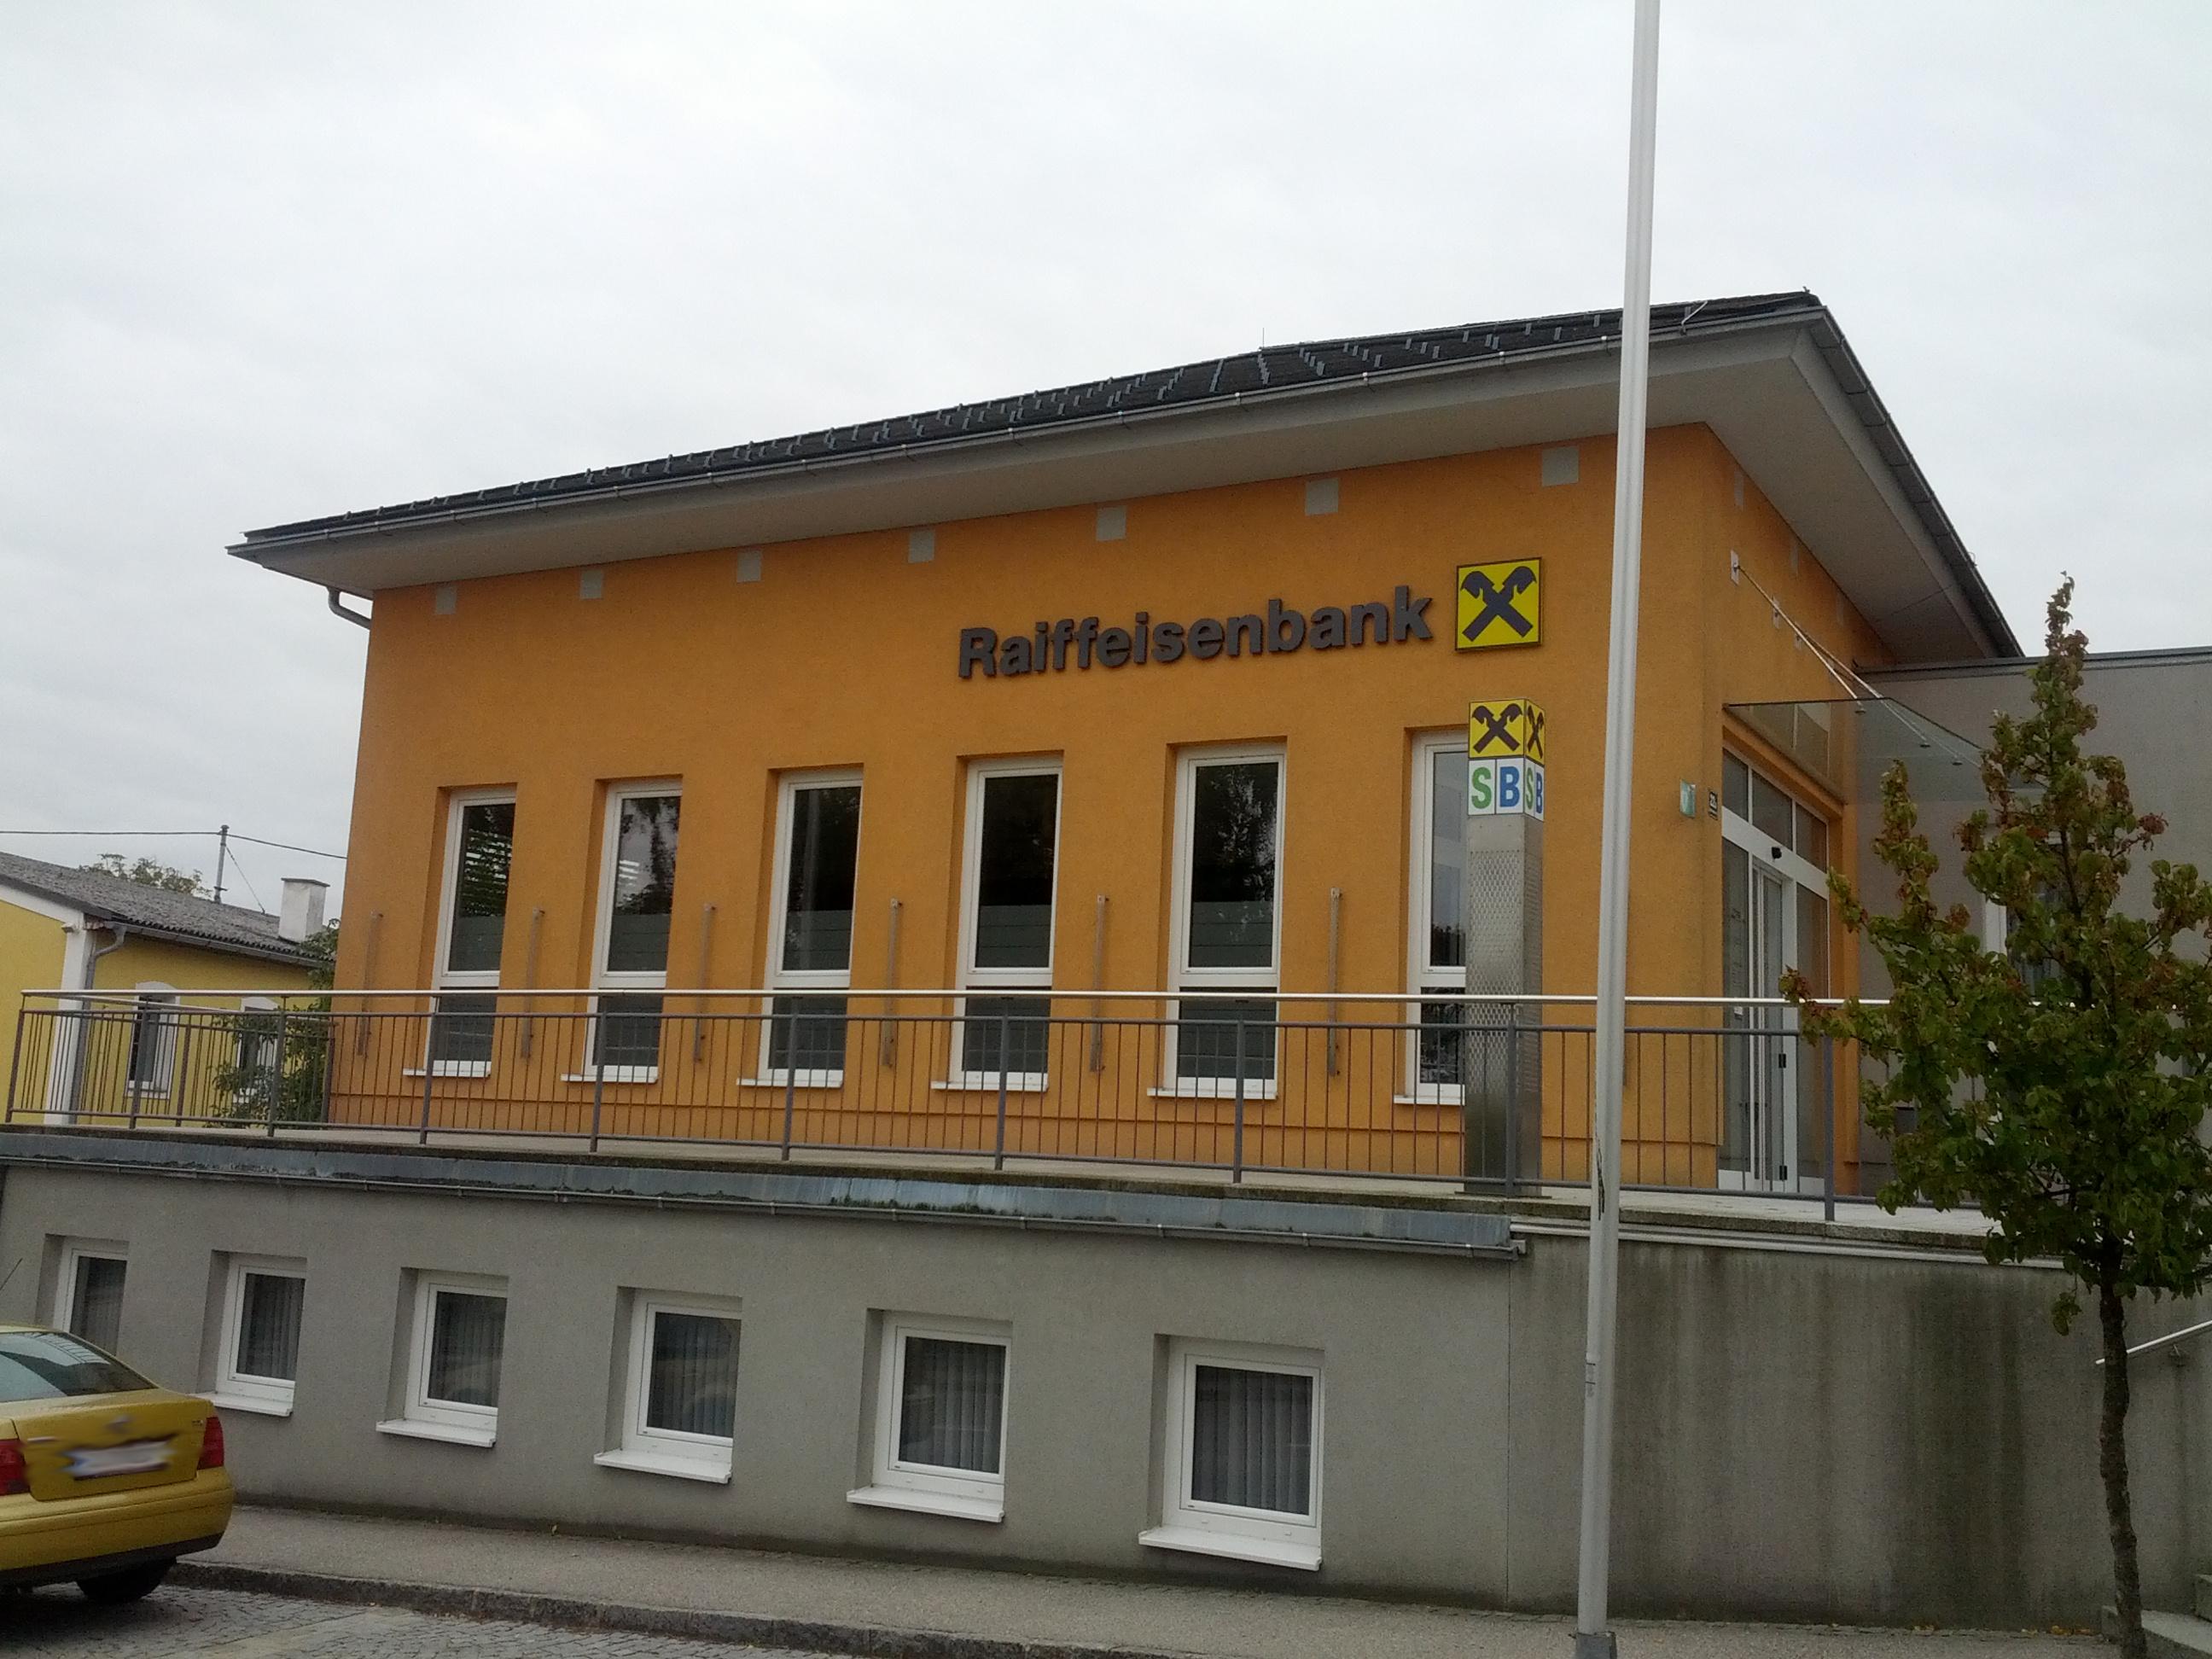 Raiffeisenbank St. Marien reg. Gen. m. b. H. Zws. Weichstetten